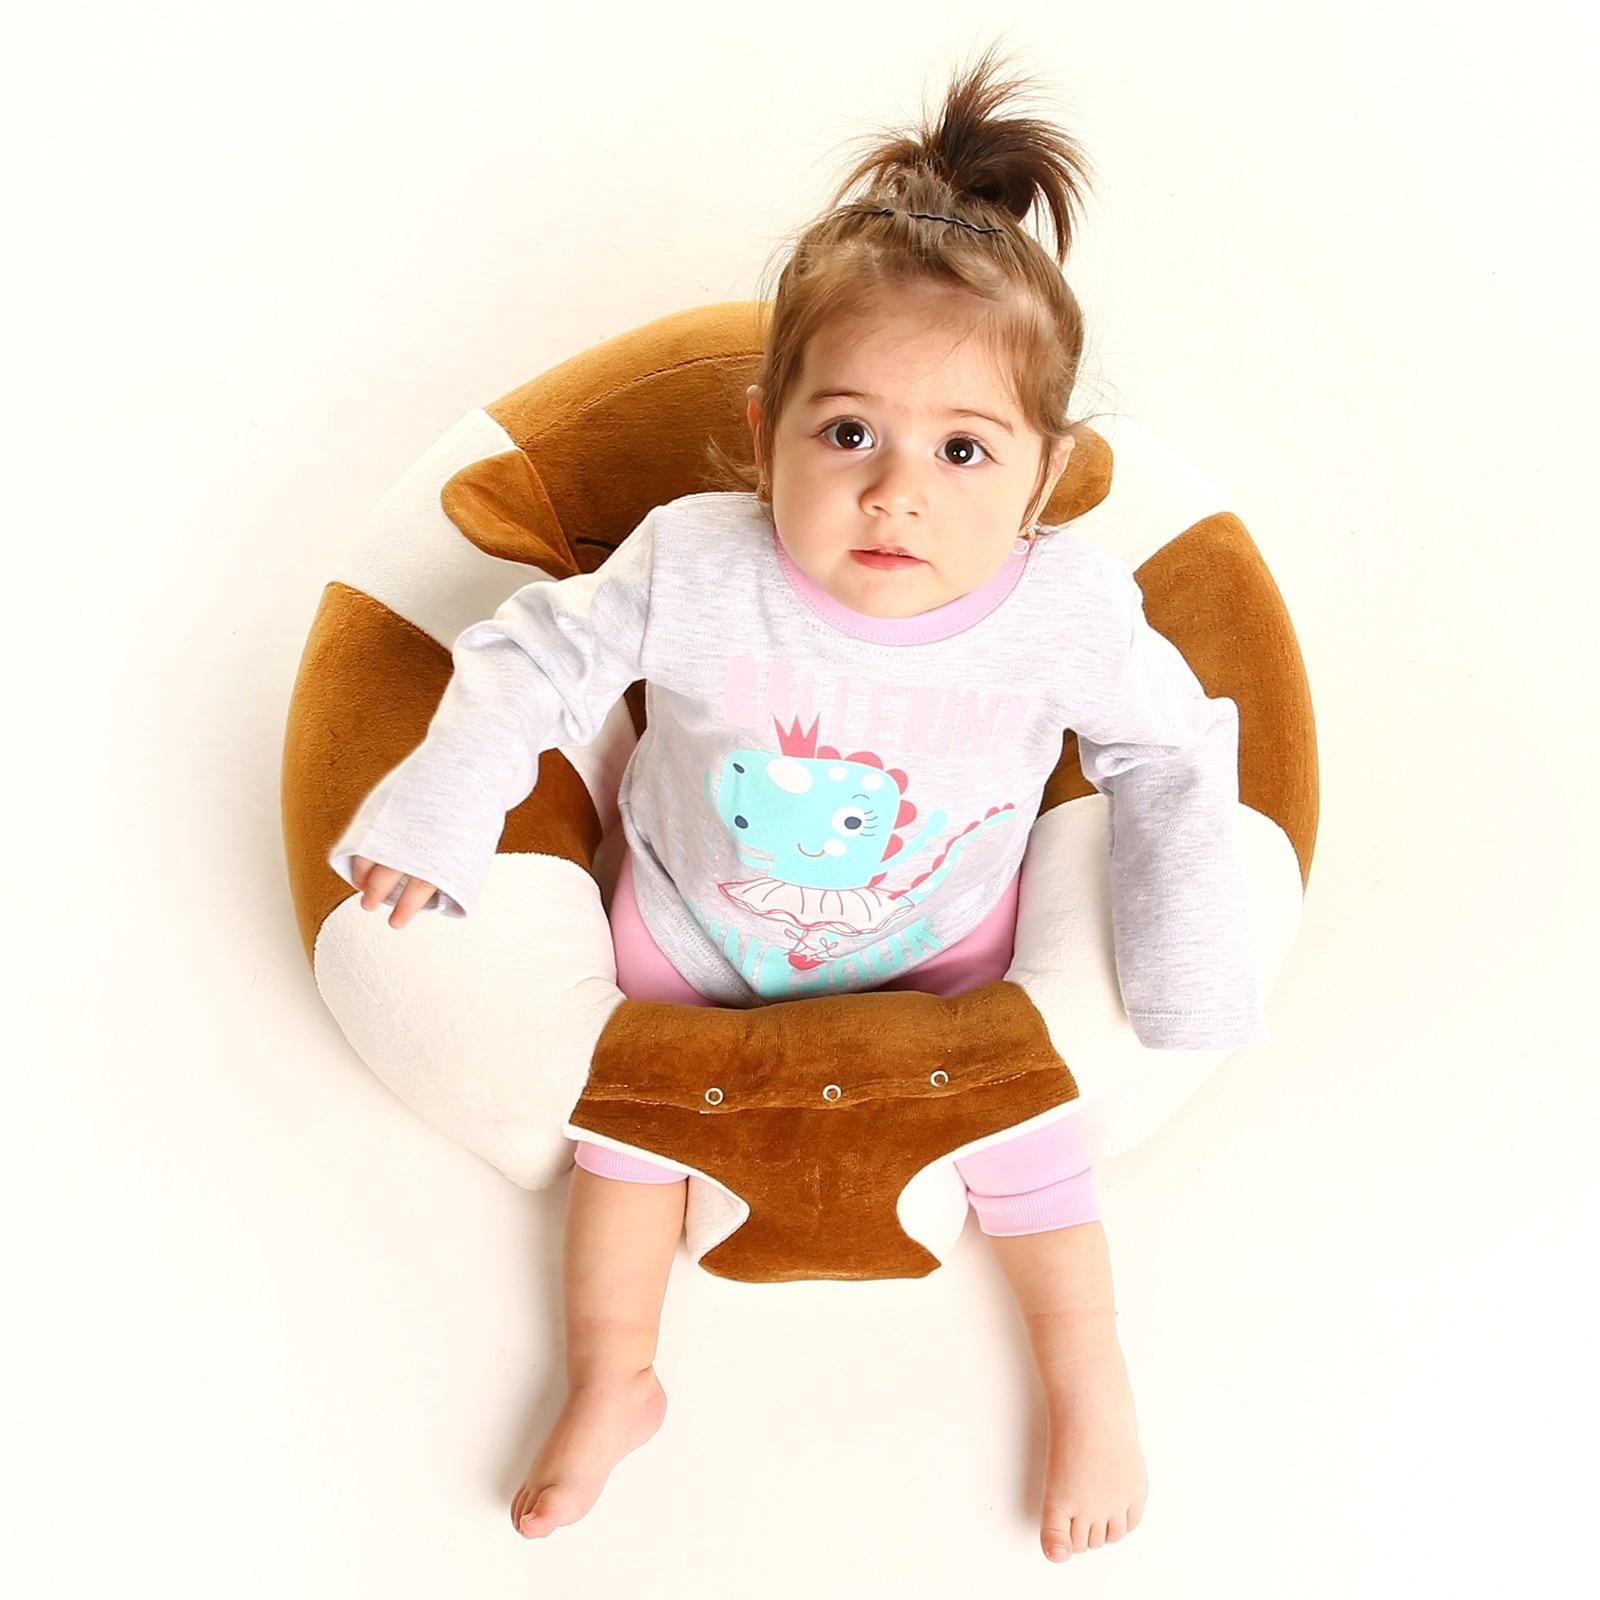 Ebebek Sevi Bebe Baby Seat Cushion